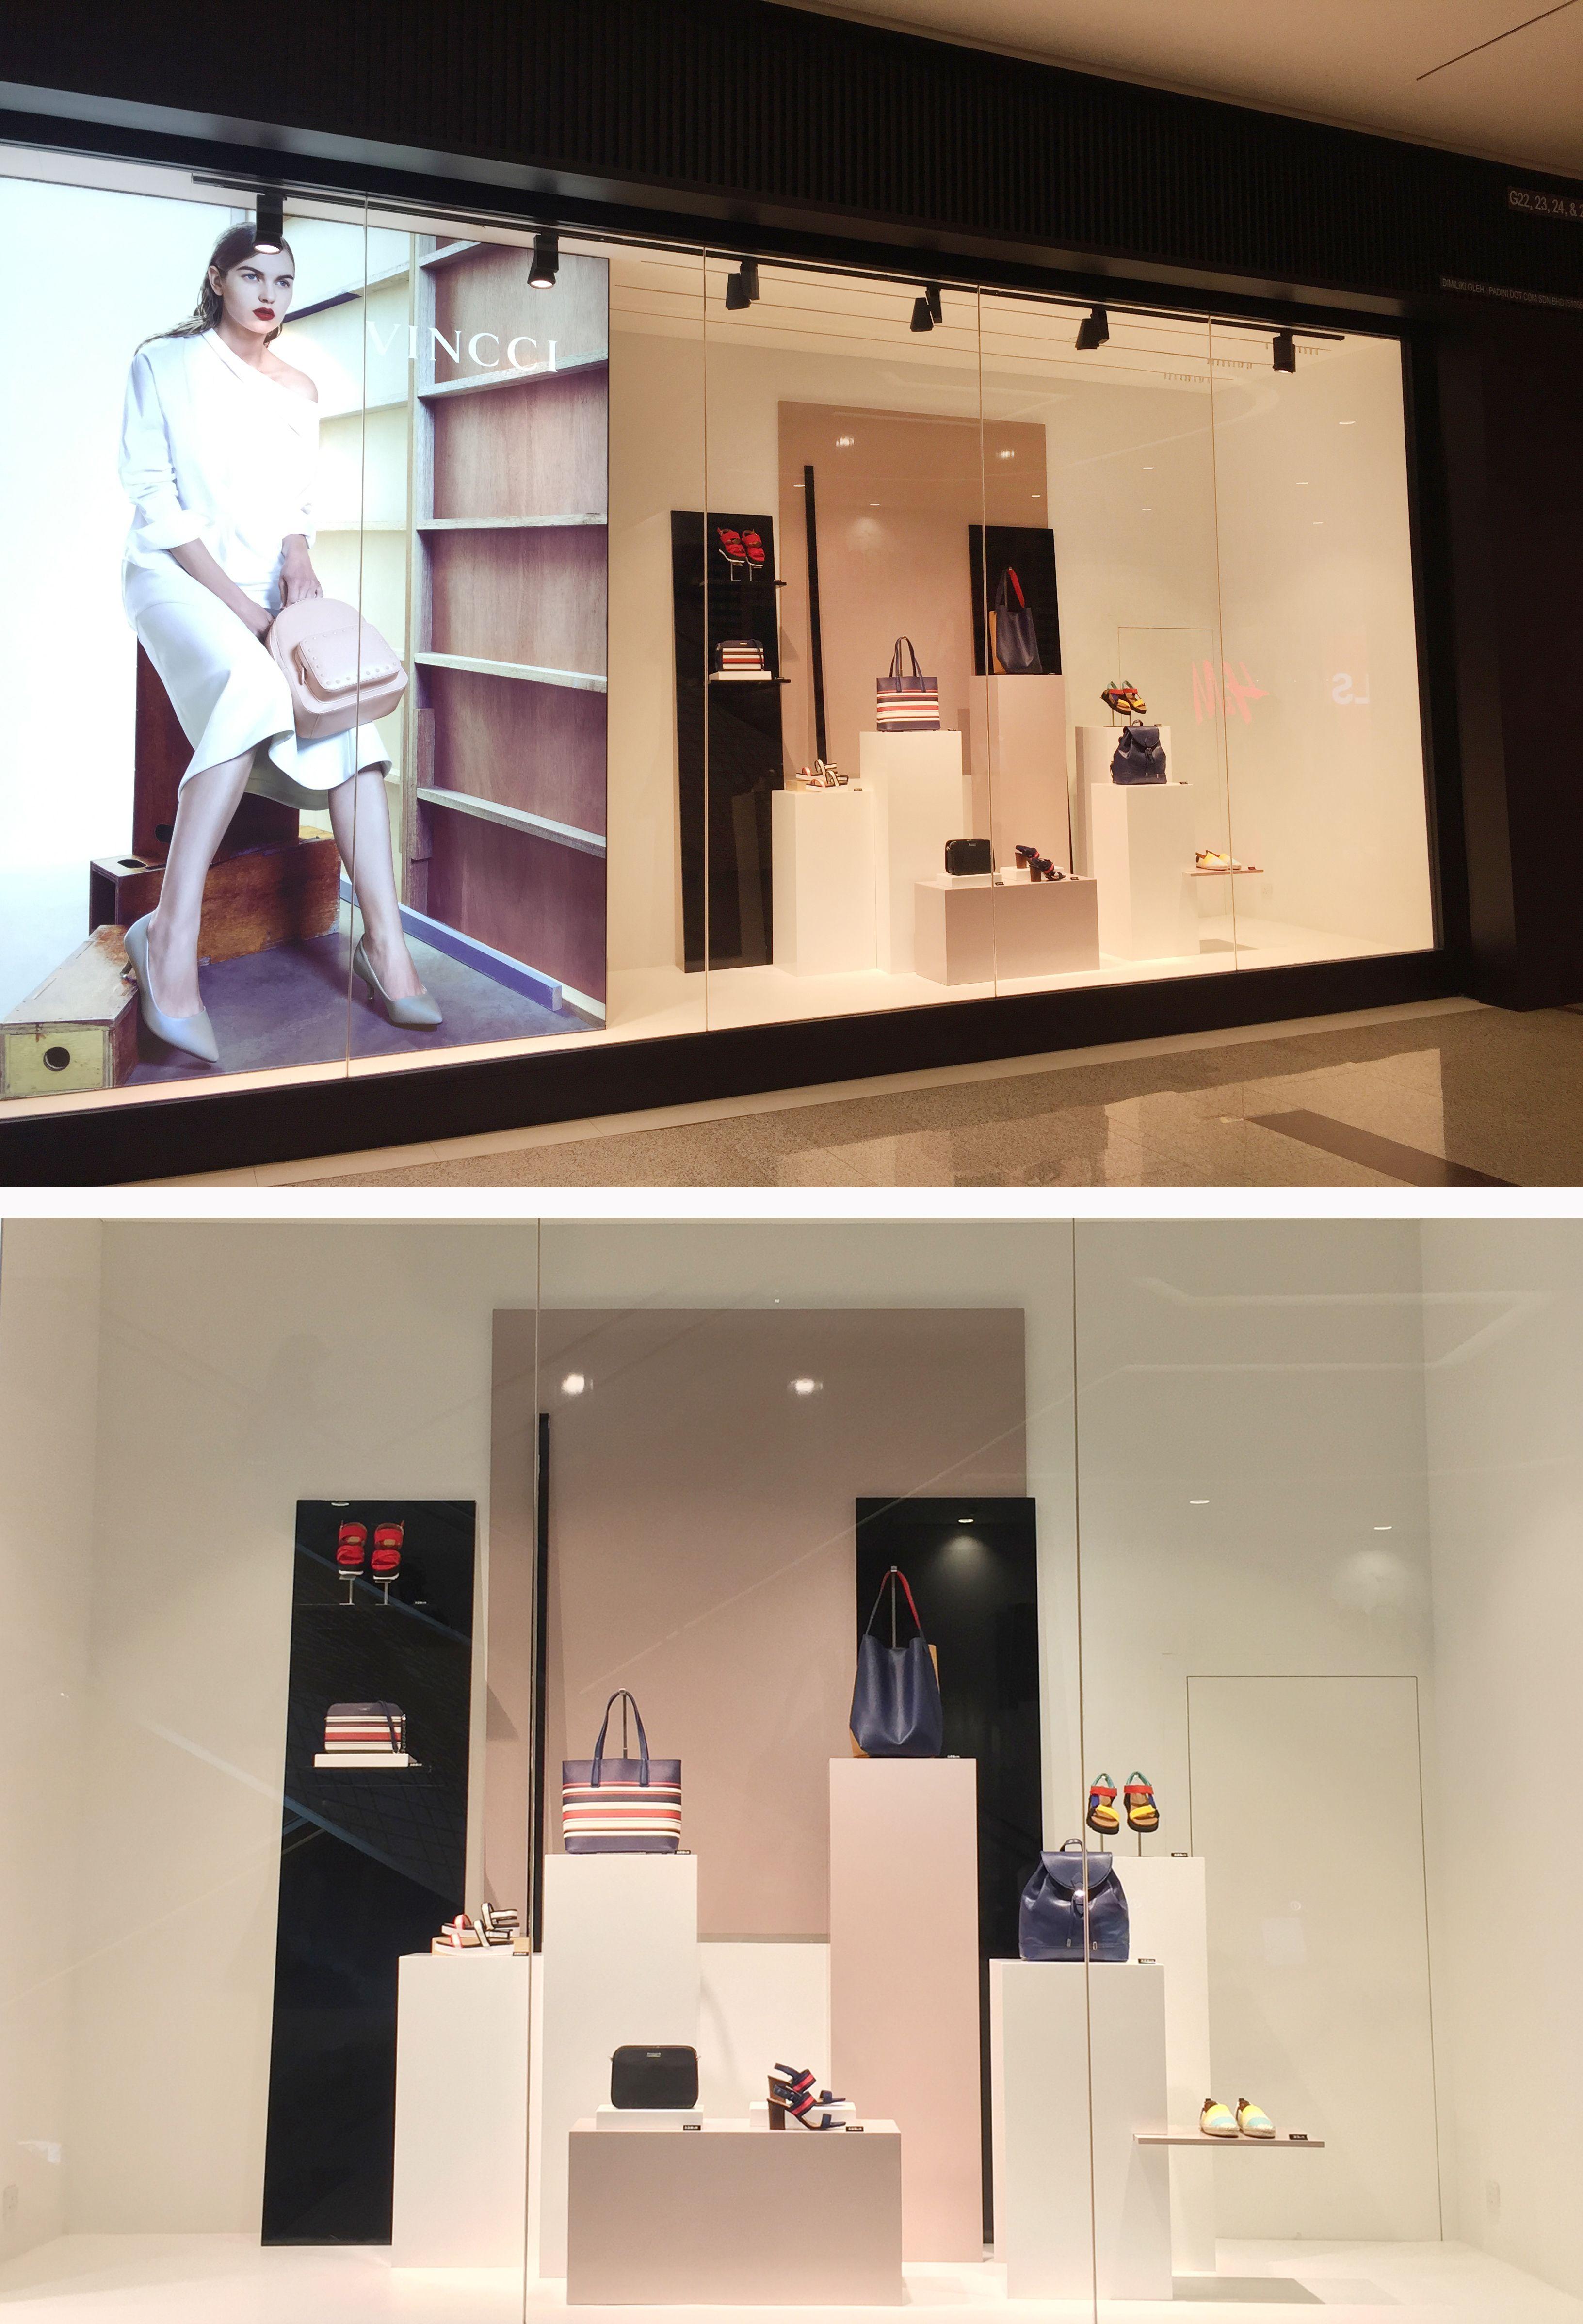 62e77254 Vincci SS2017 Window Display #VincciVM @ Sunway Velocity Mall, Kuala Lumpur.